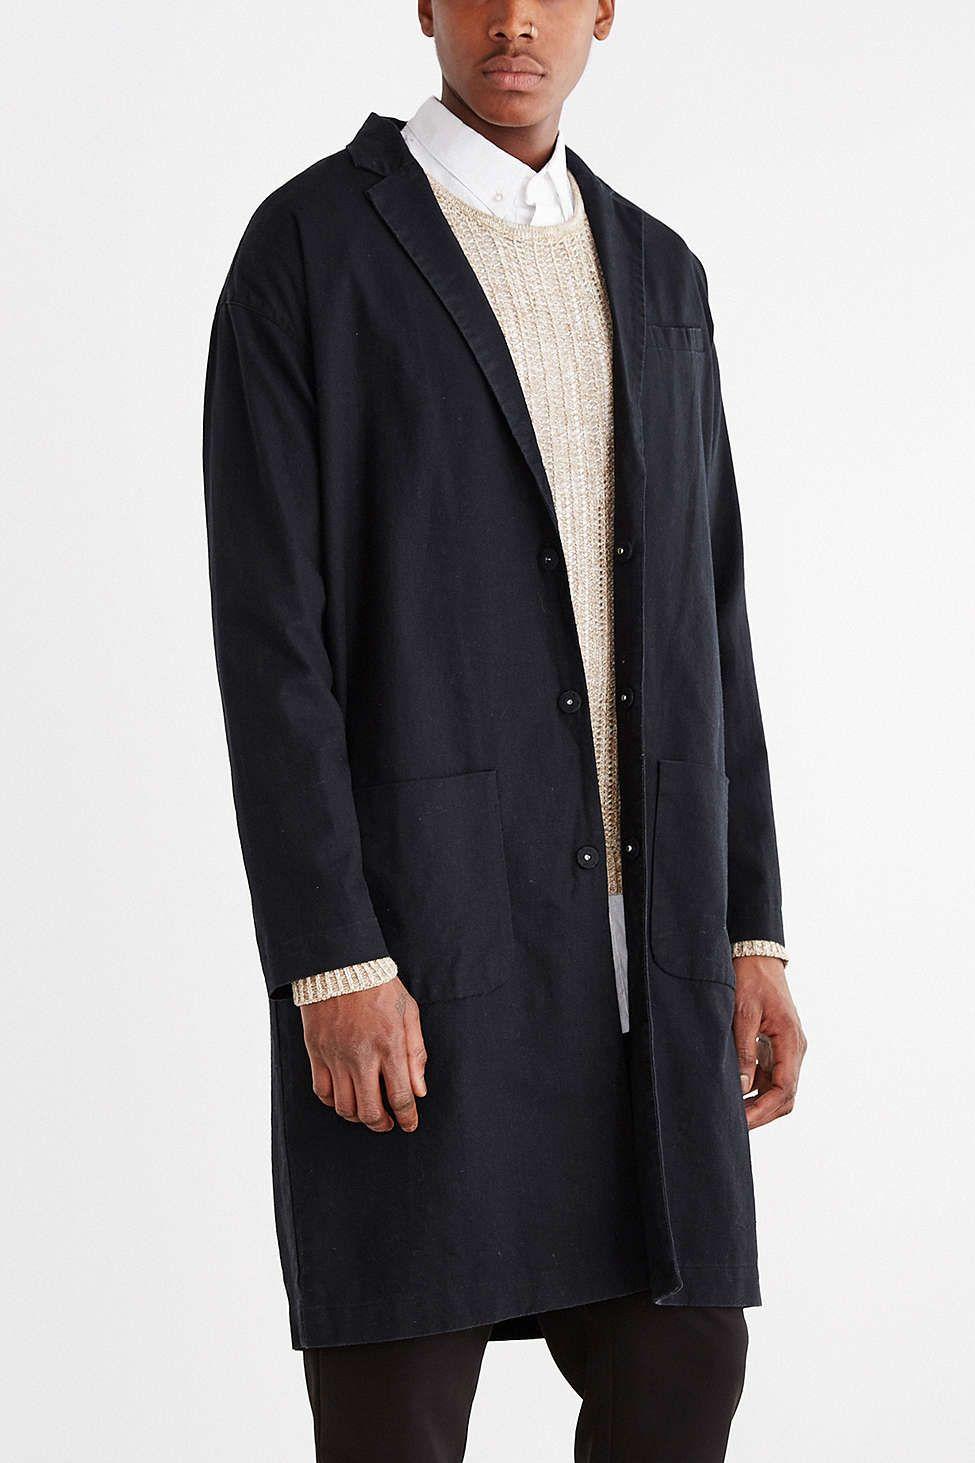 b17b12dc Your Neighbors Linen Duster Jacket | Style: Men | Duster jacket ...